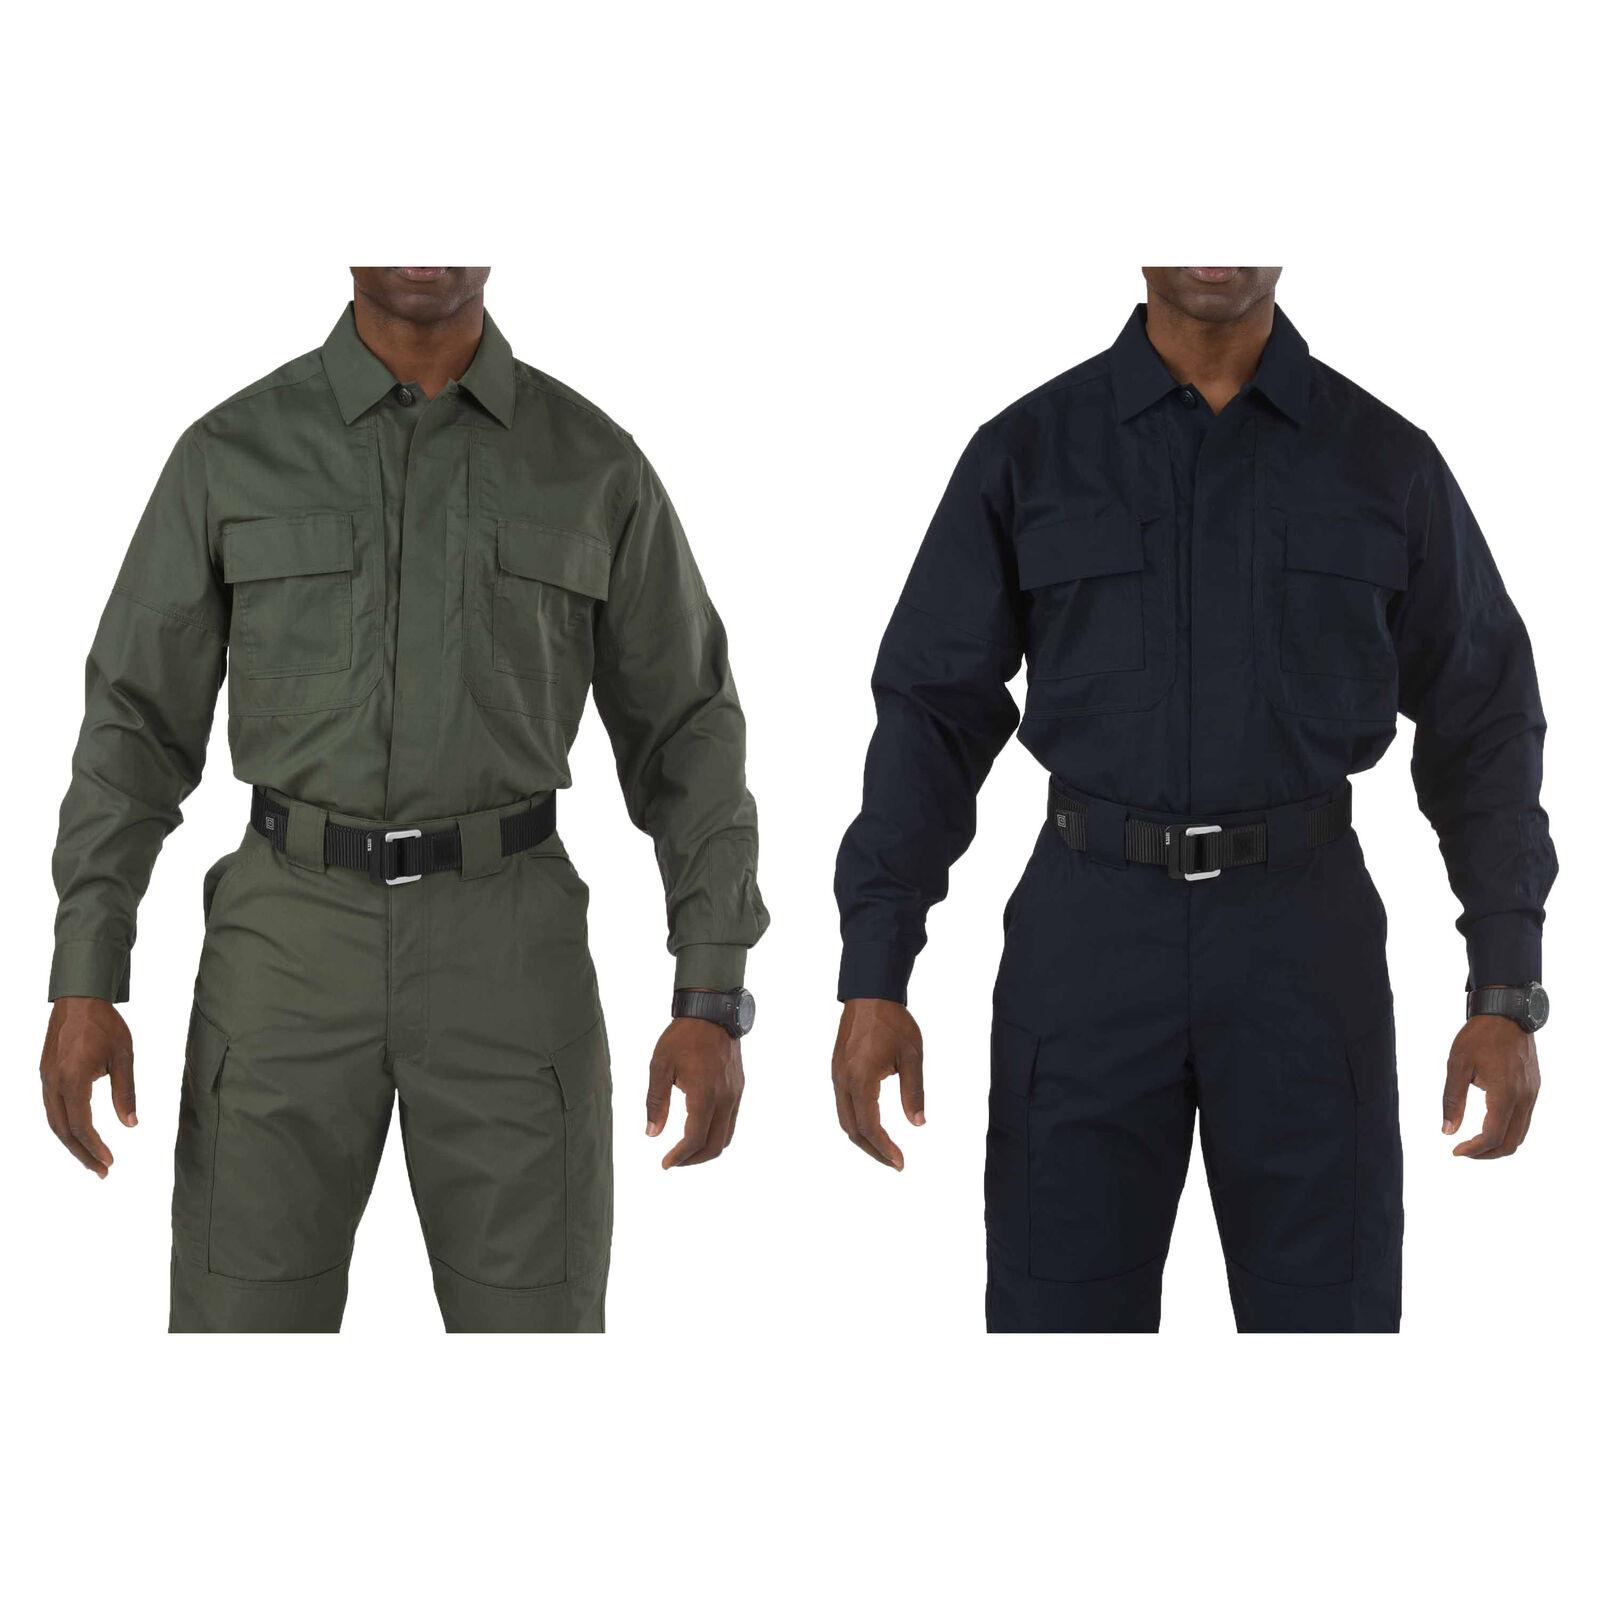 5.11 Tactical Taclite TDU Long-Sleeve Shirt, Style 72054T, Sizes S-5XL, Big&Tall